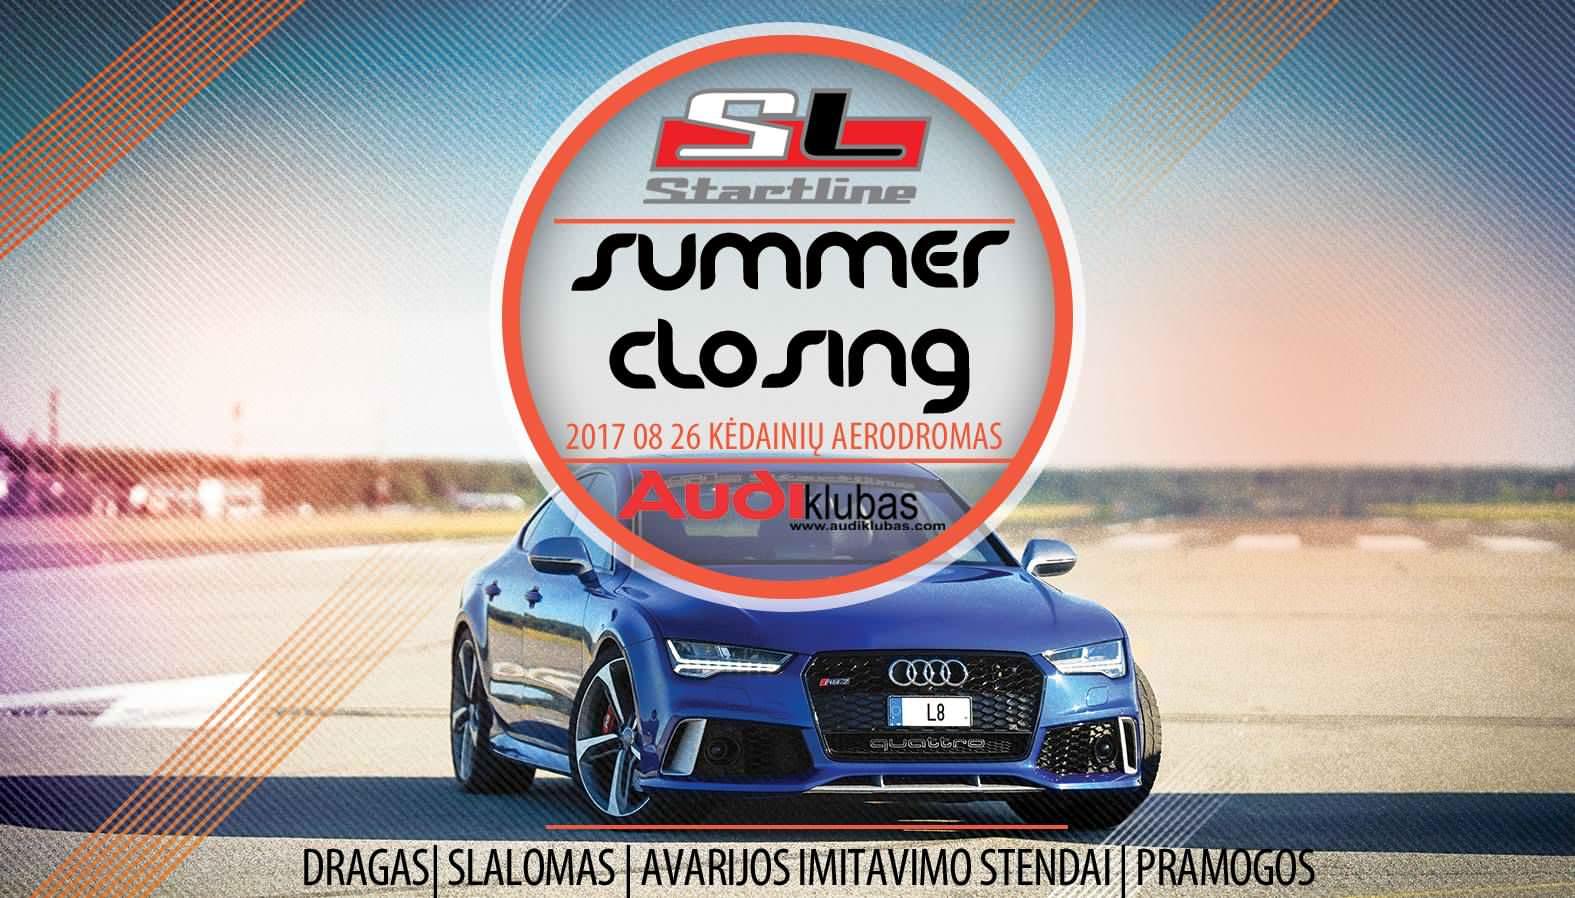 Startline & Audi klubas summer closing